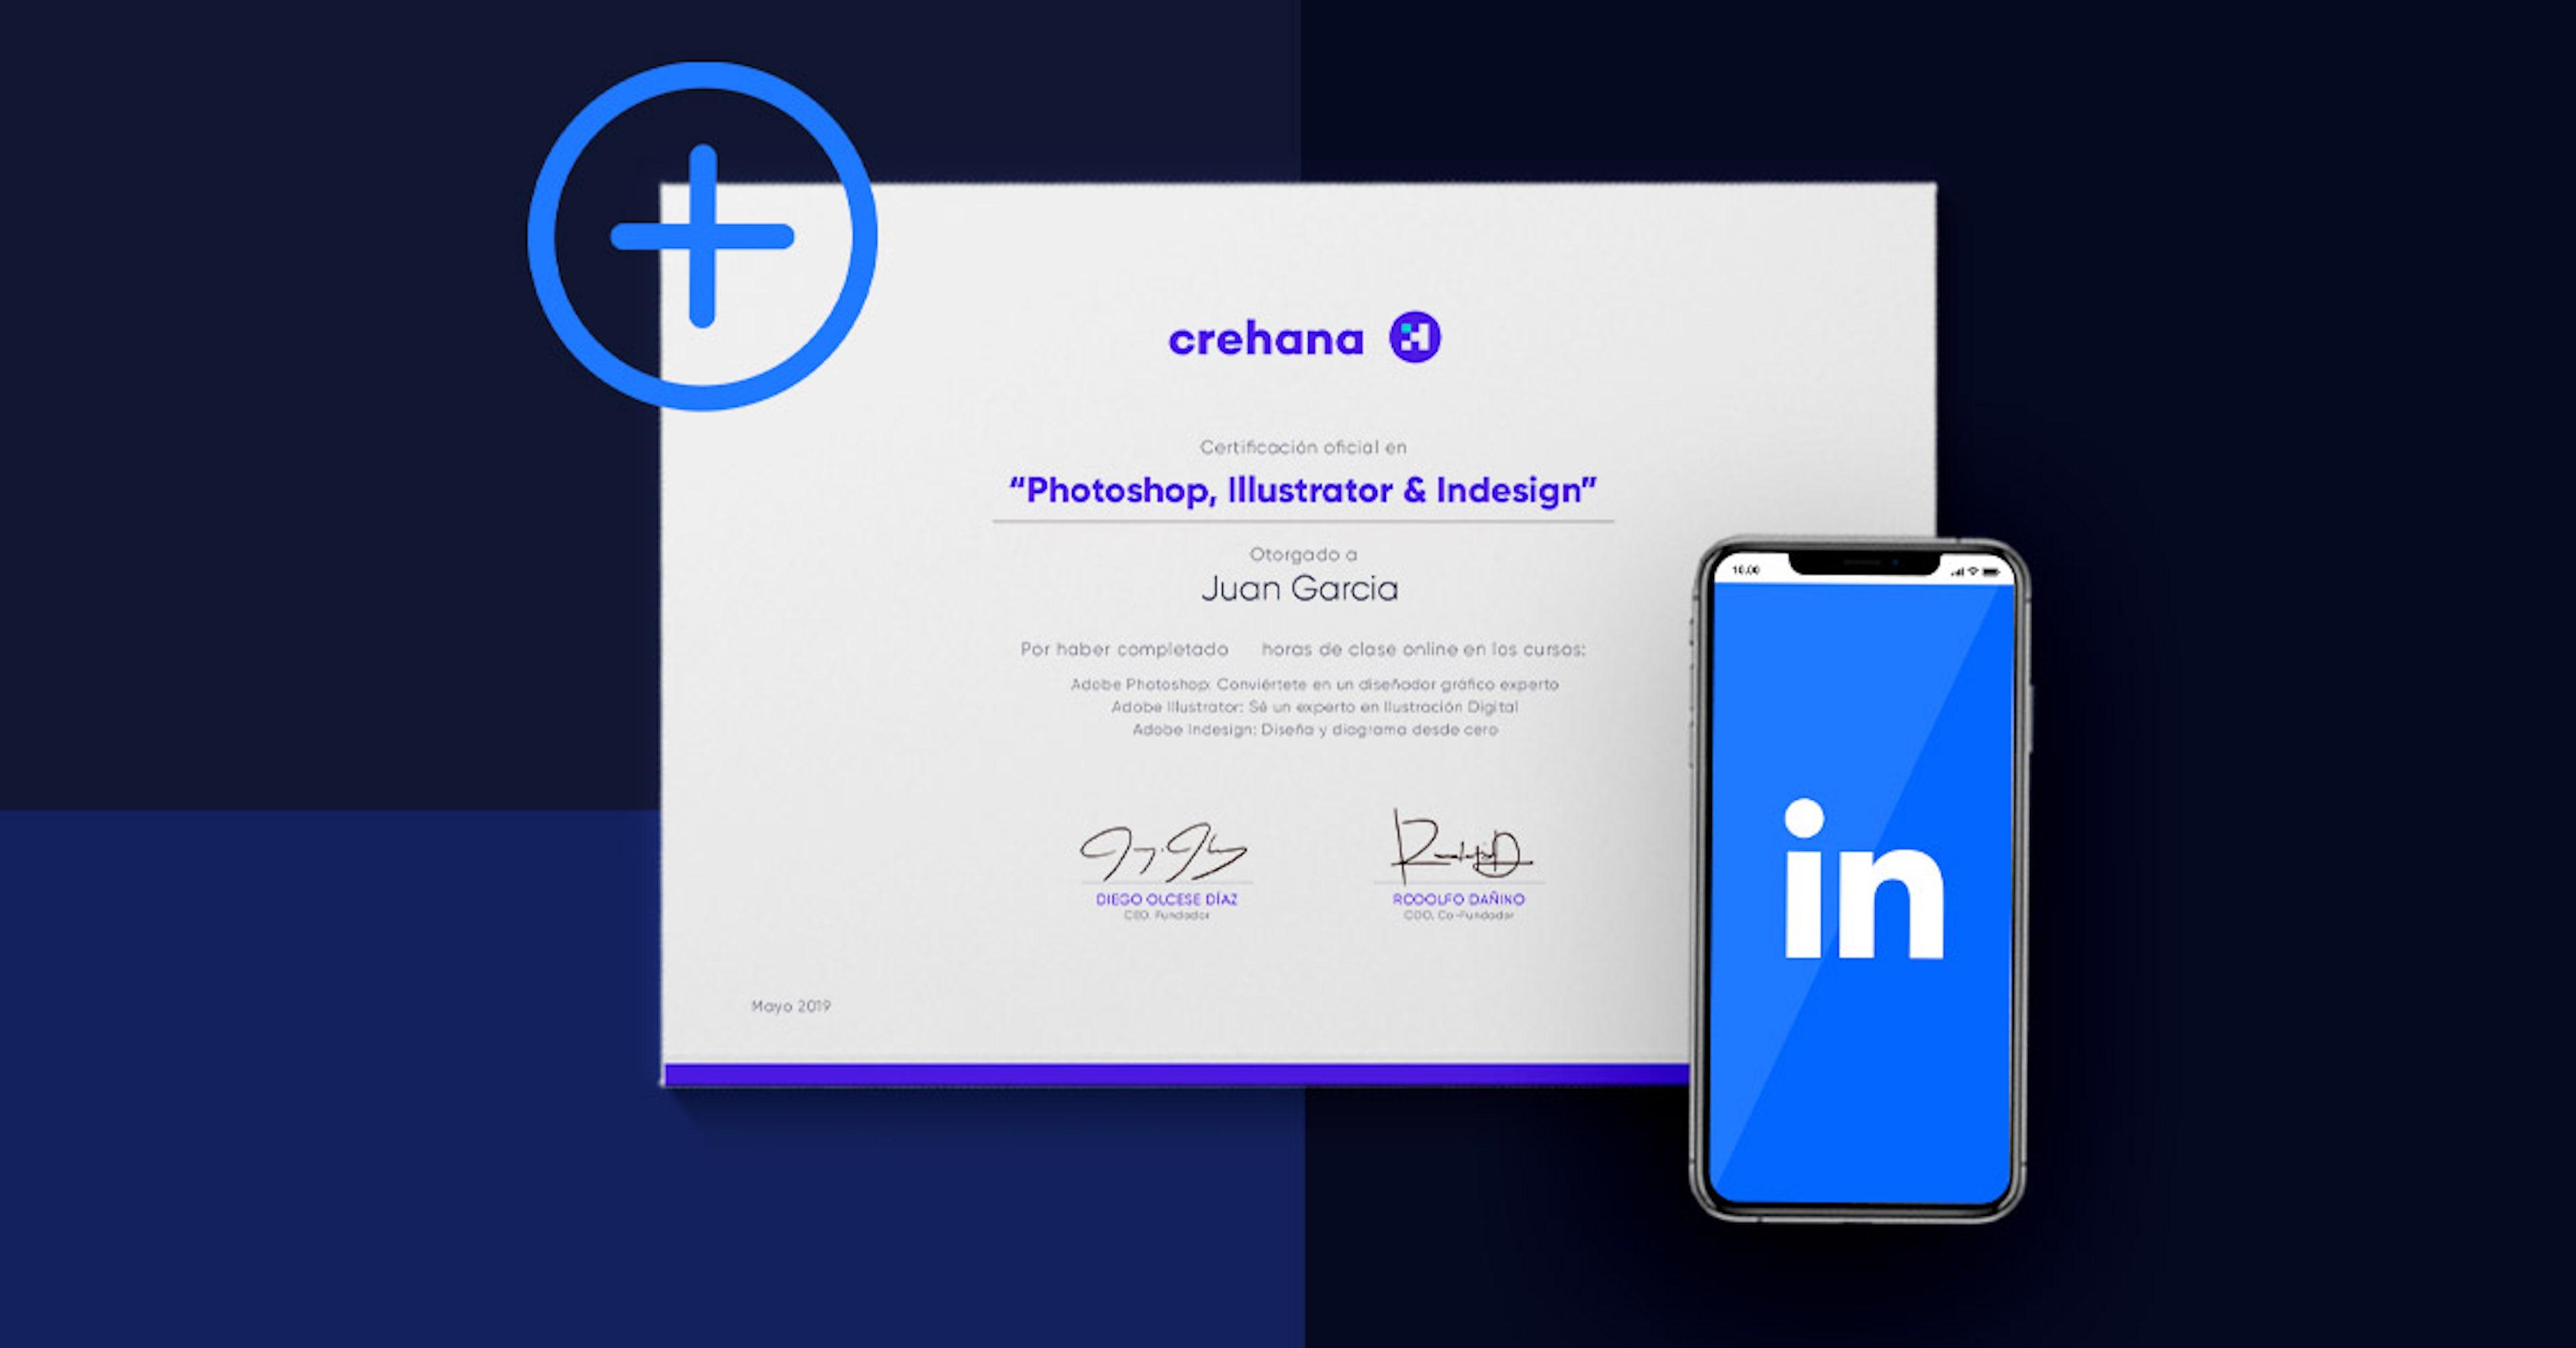 ¿Cómo agregar tu certificado de Crehana a LinkedIn?